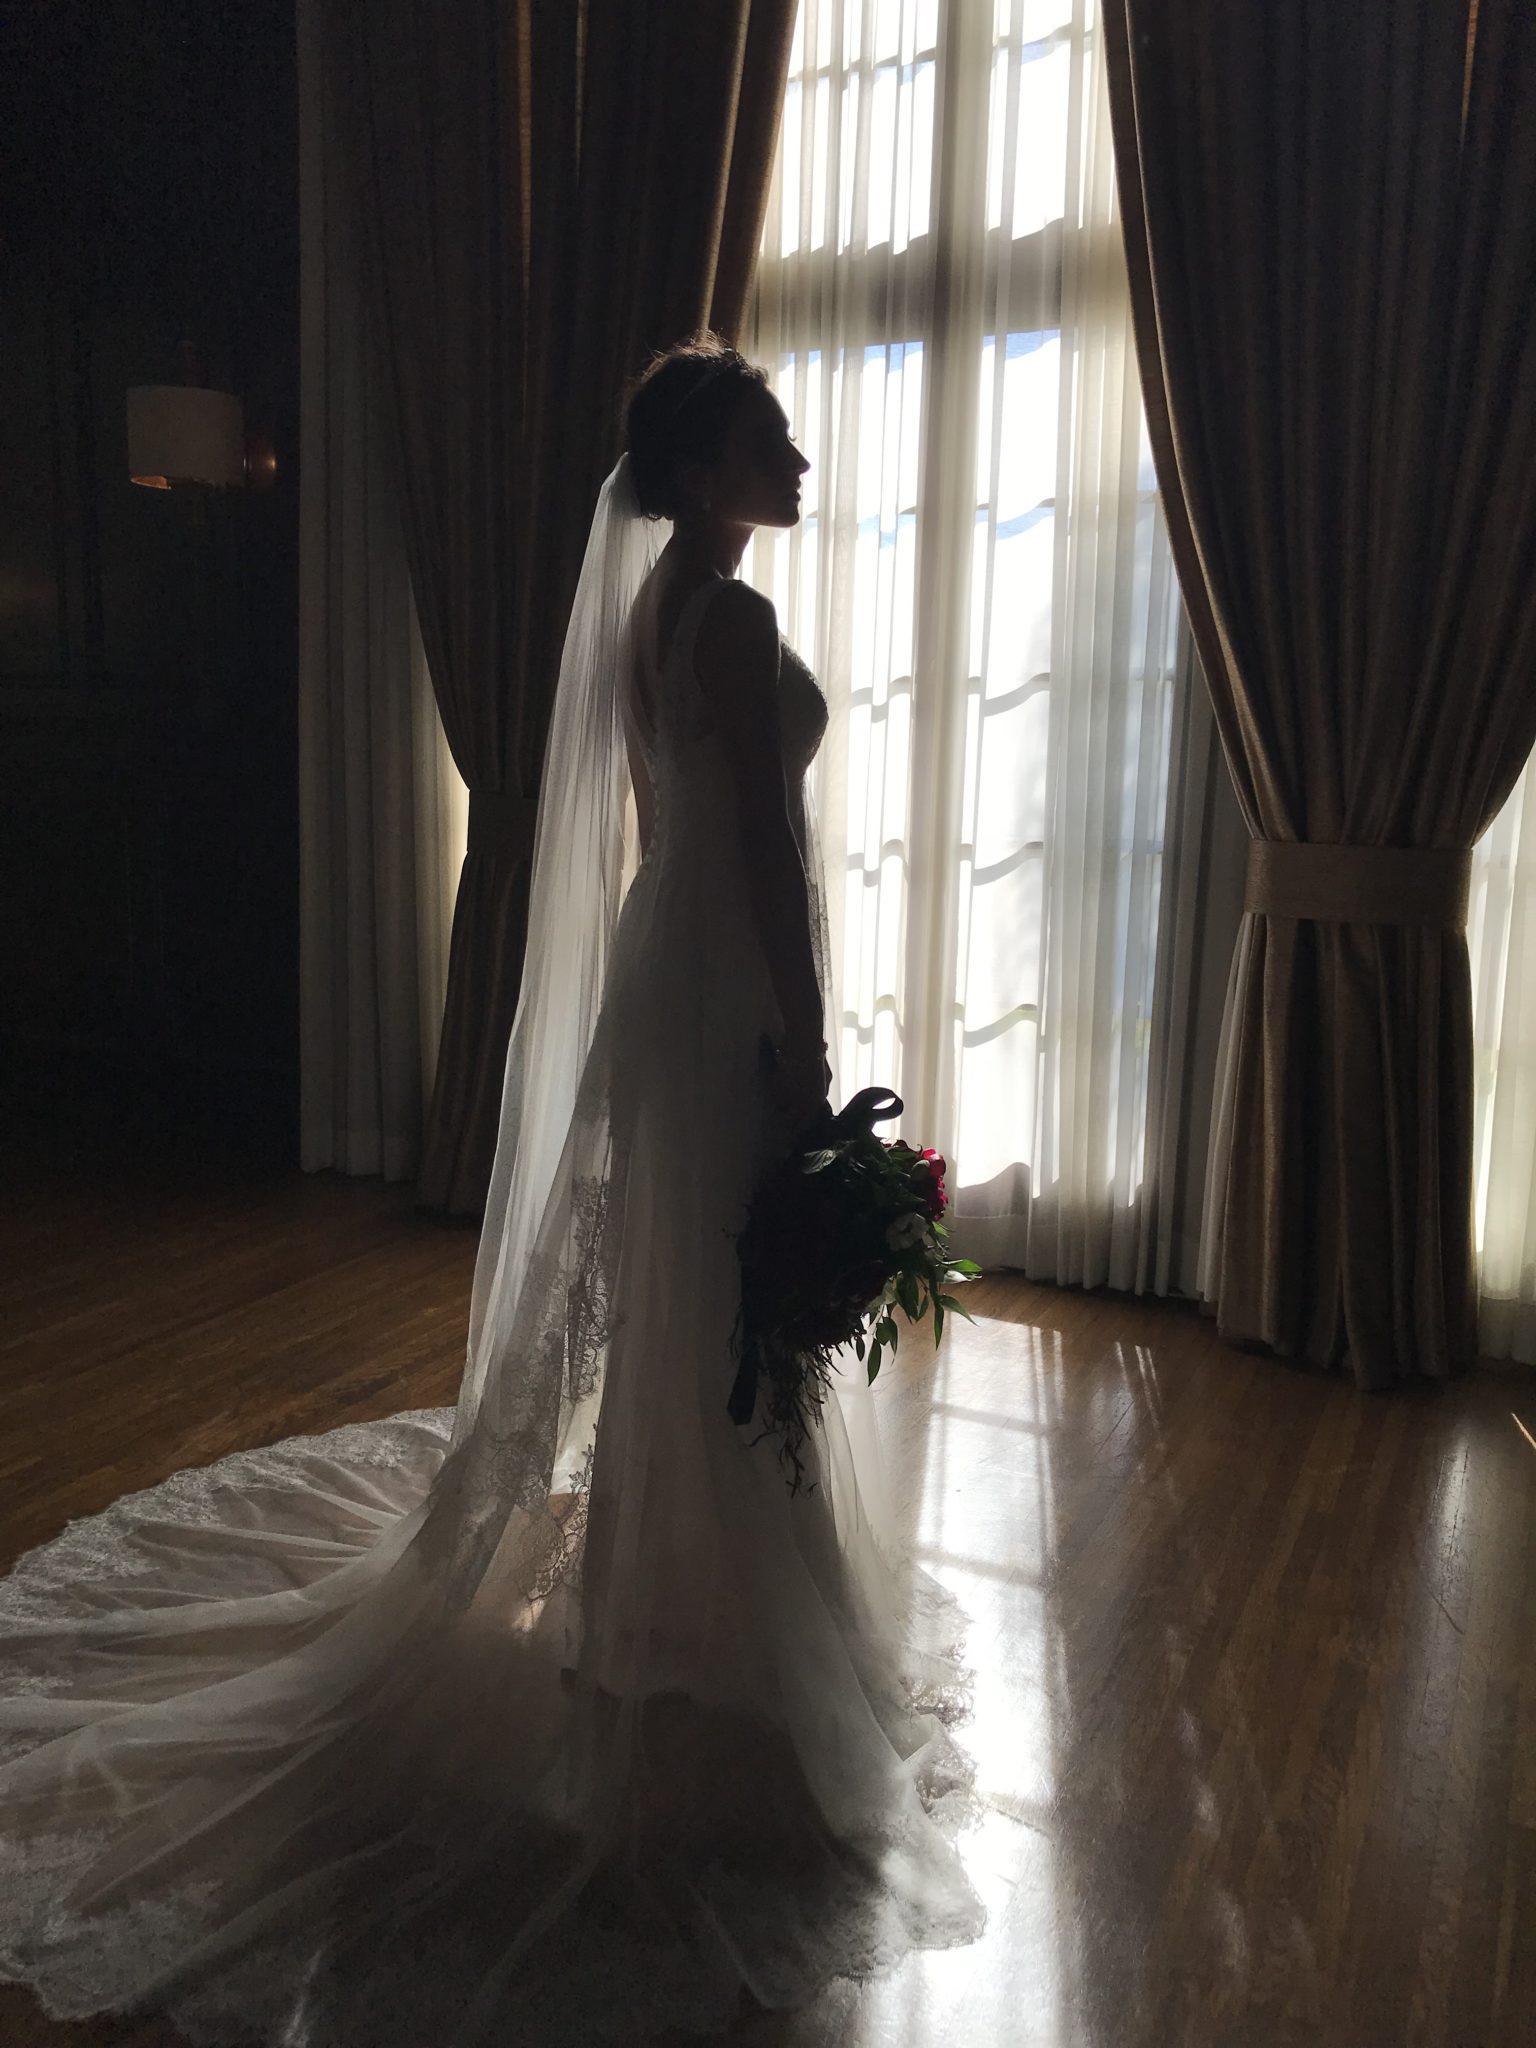 The Royal Wedding Dress: David's Bridal Designers' Predictions